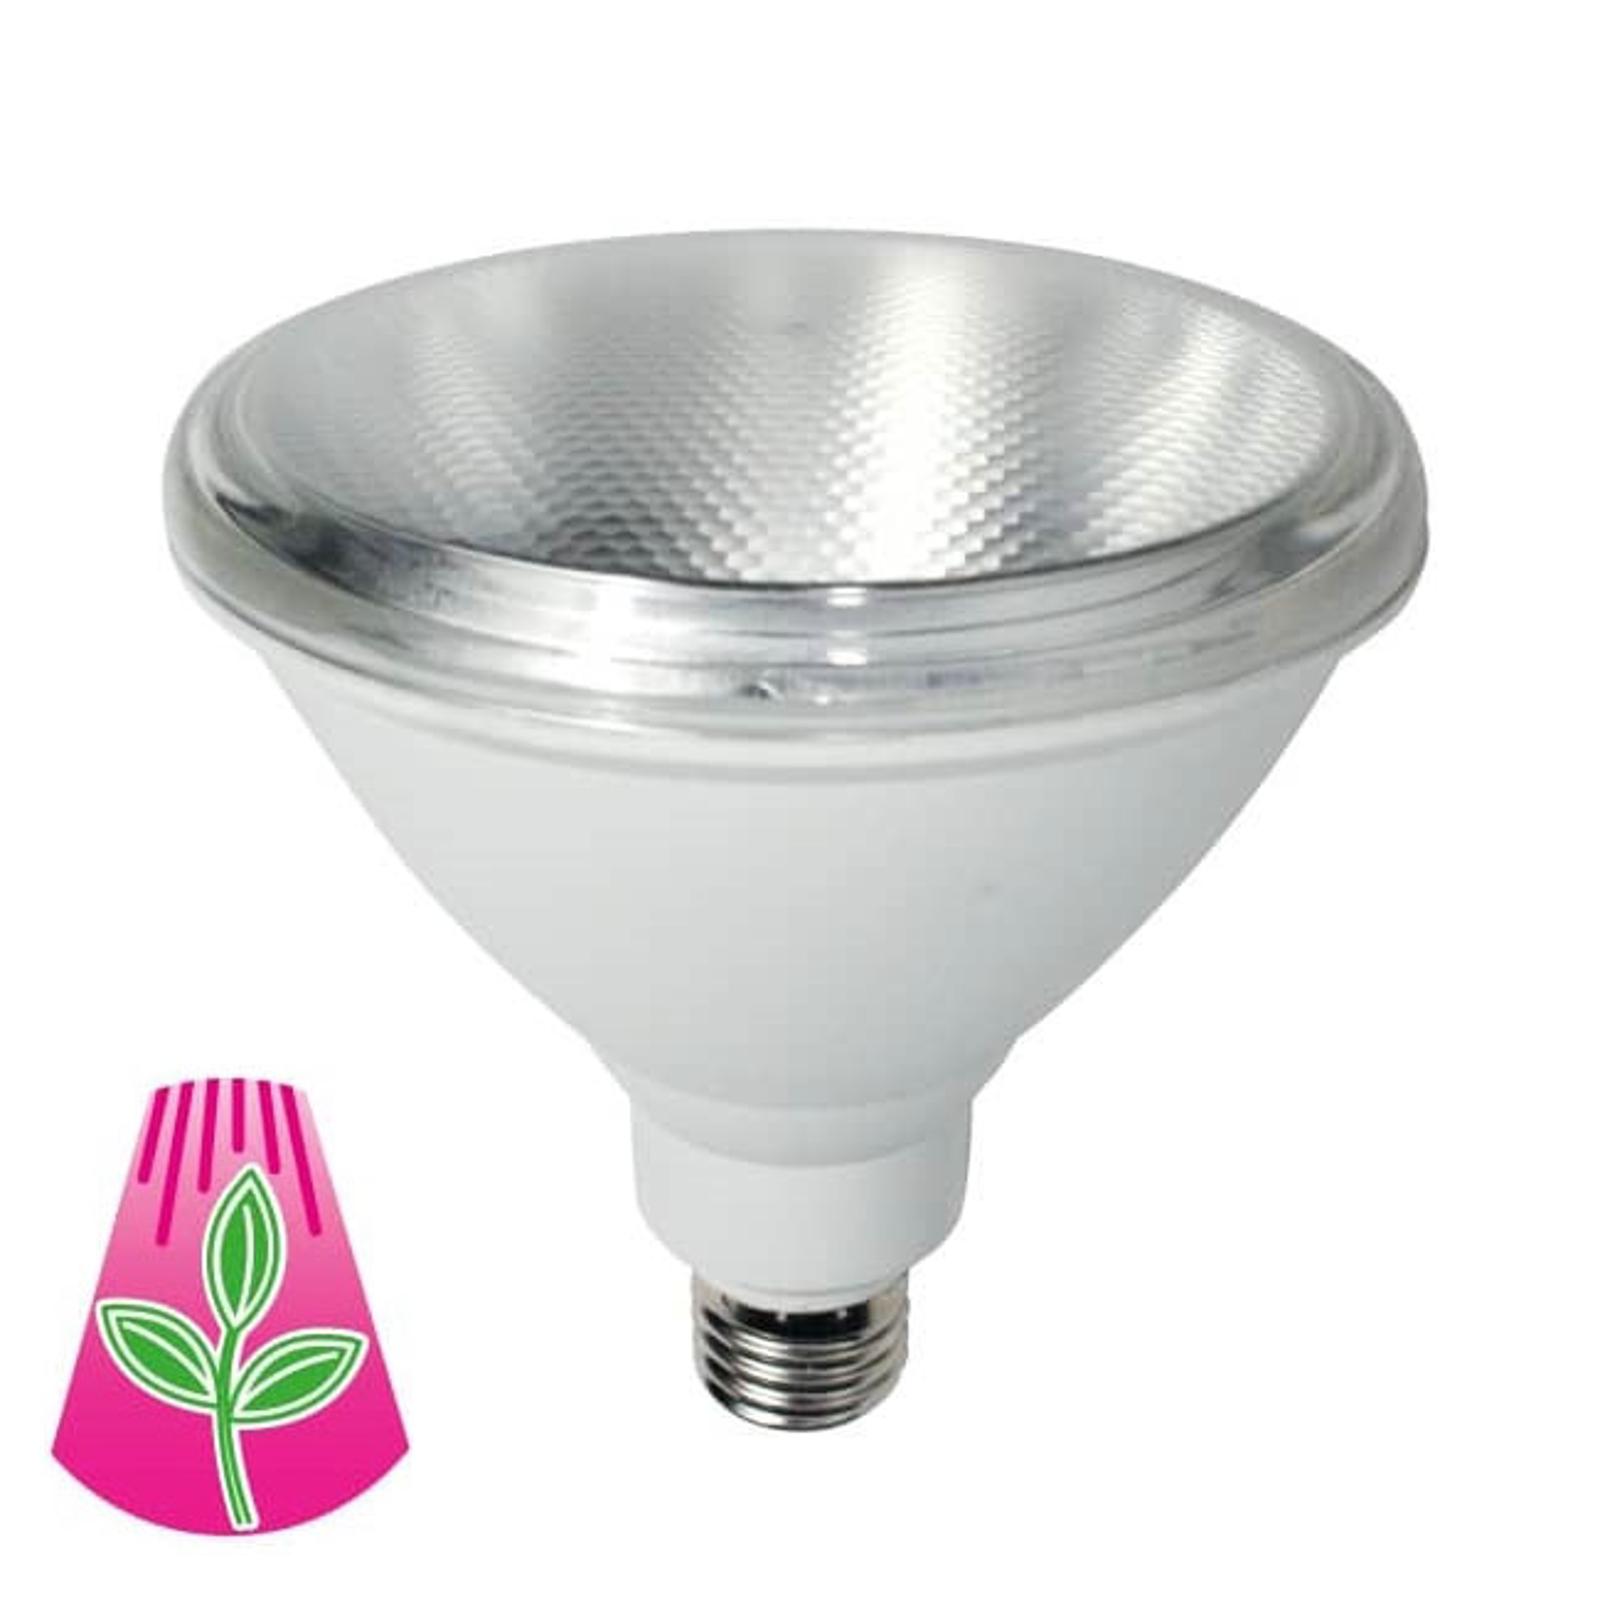 LED-Pflanzenlampe E27 PAR38 10W Vollspektrum